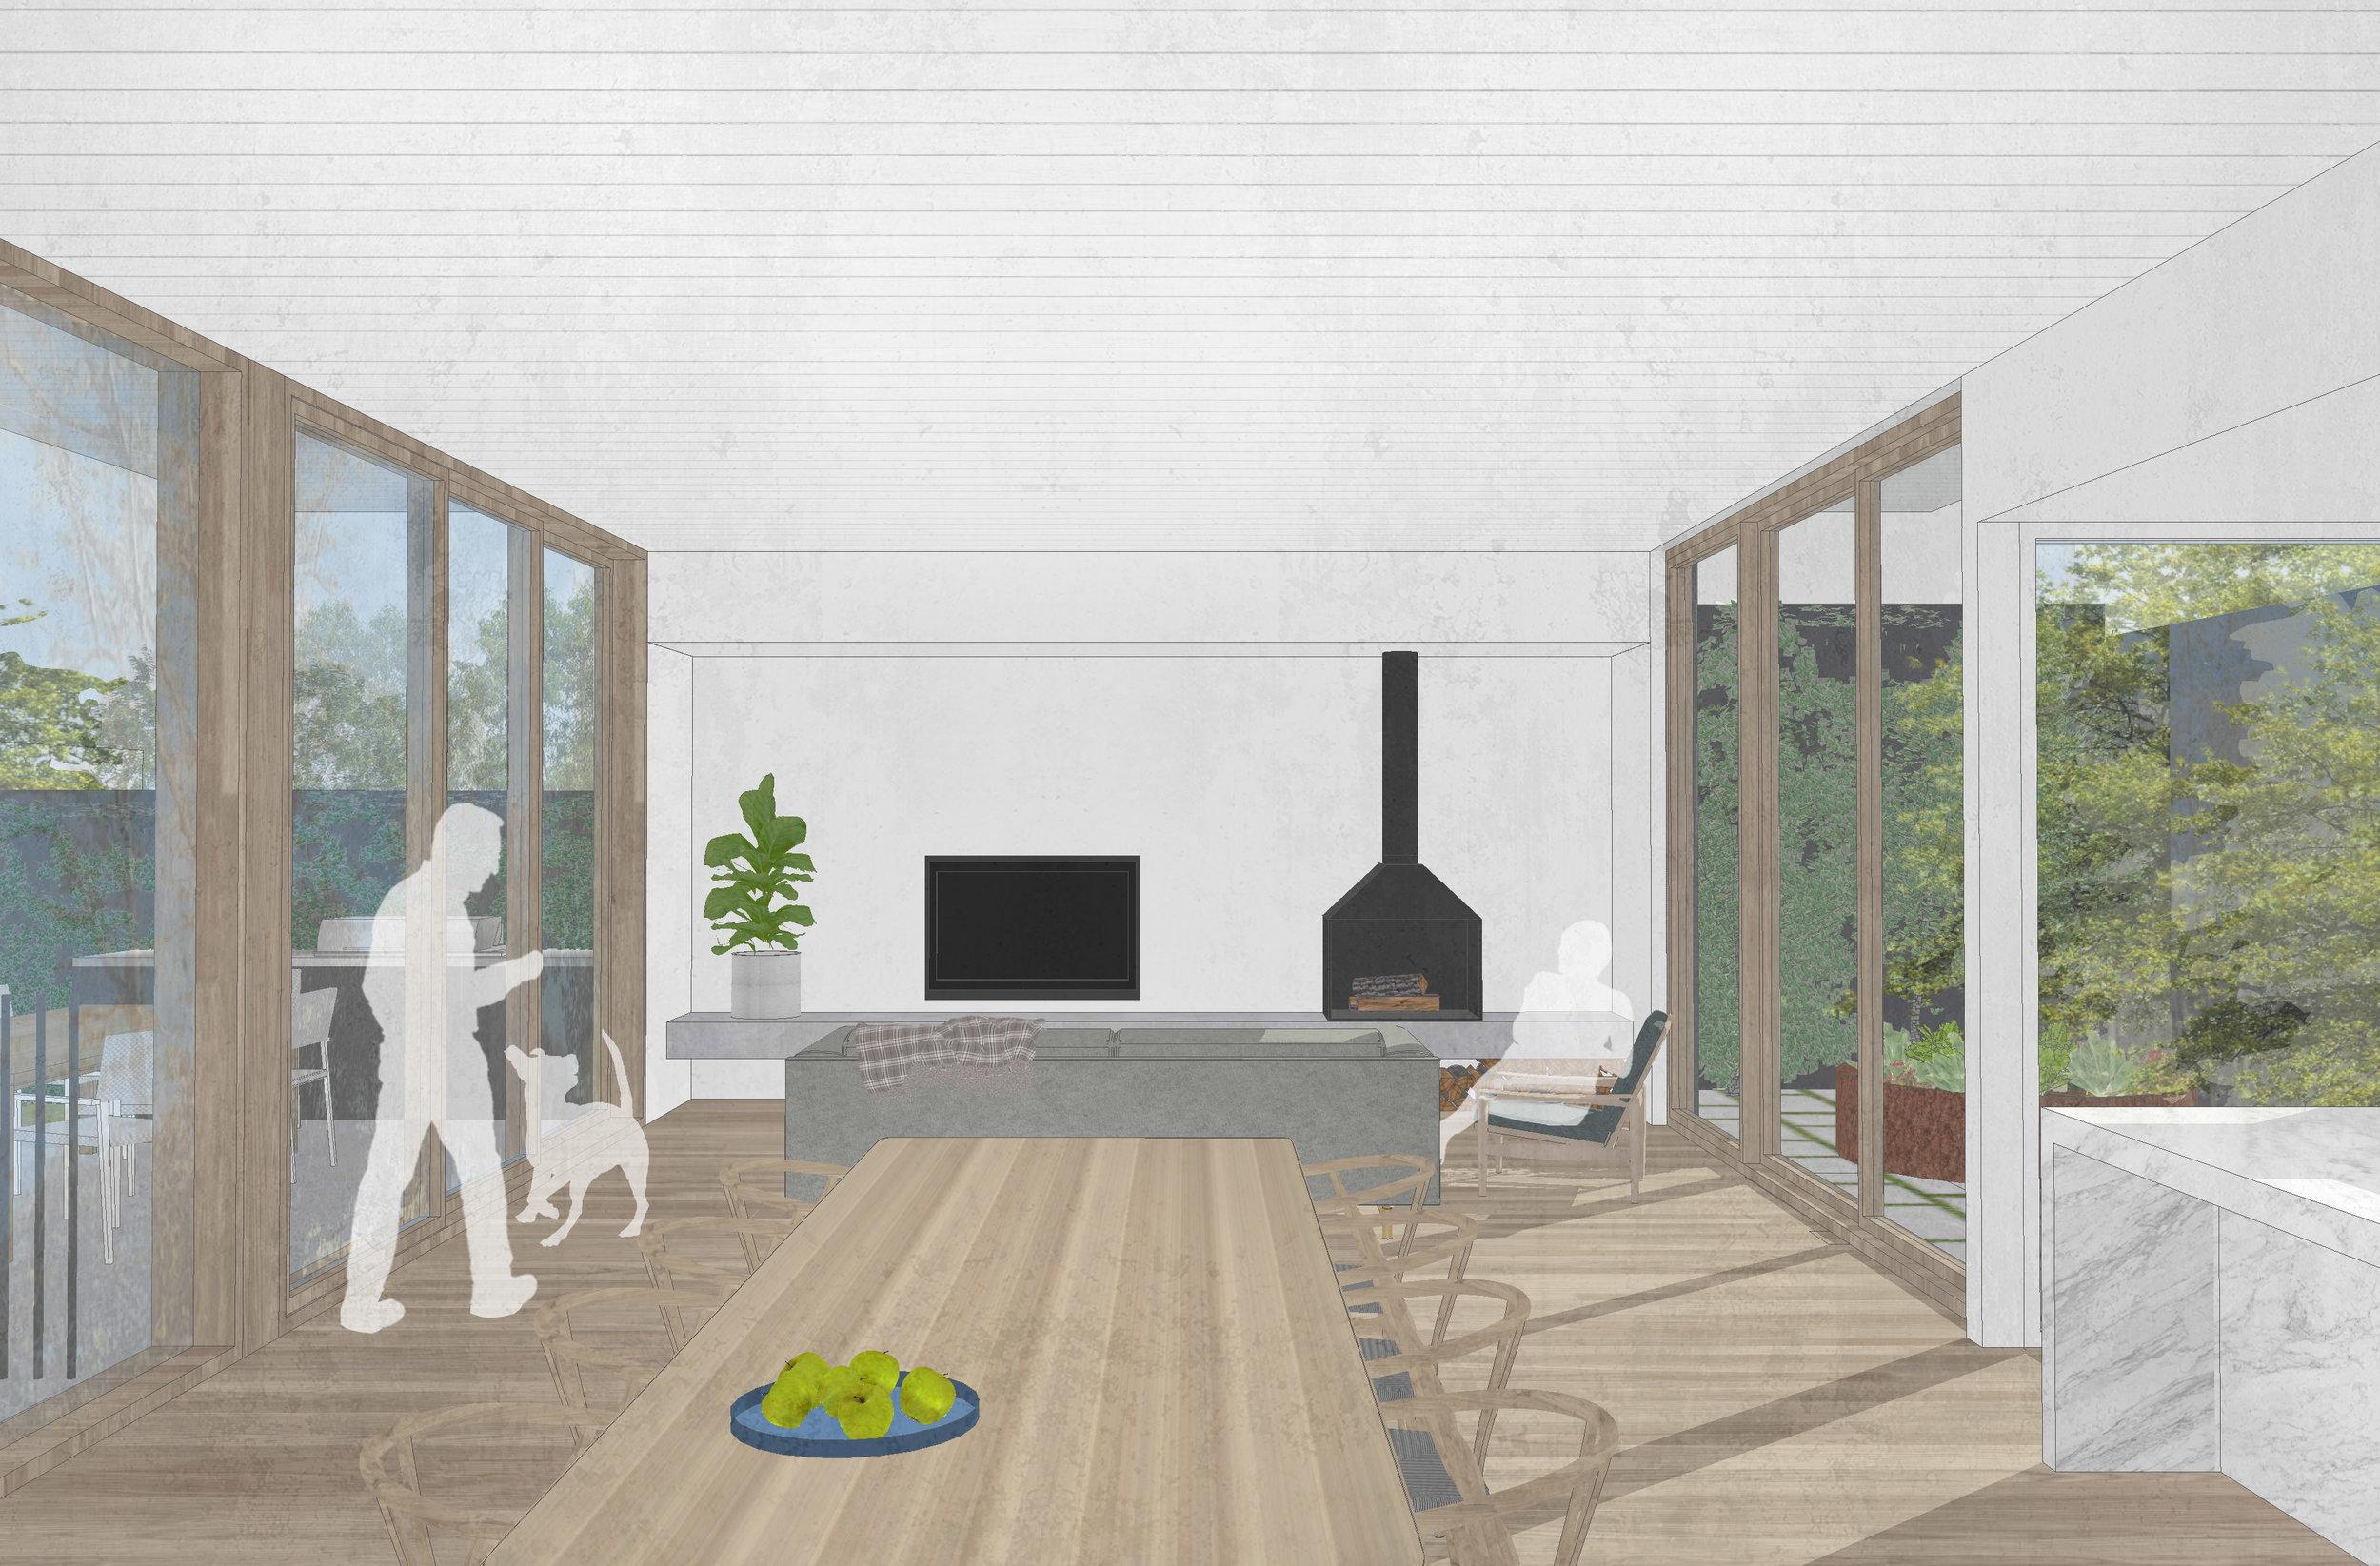 Bower Architecture_ Work in rpgoress